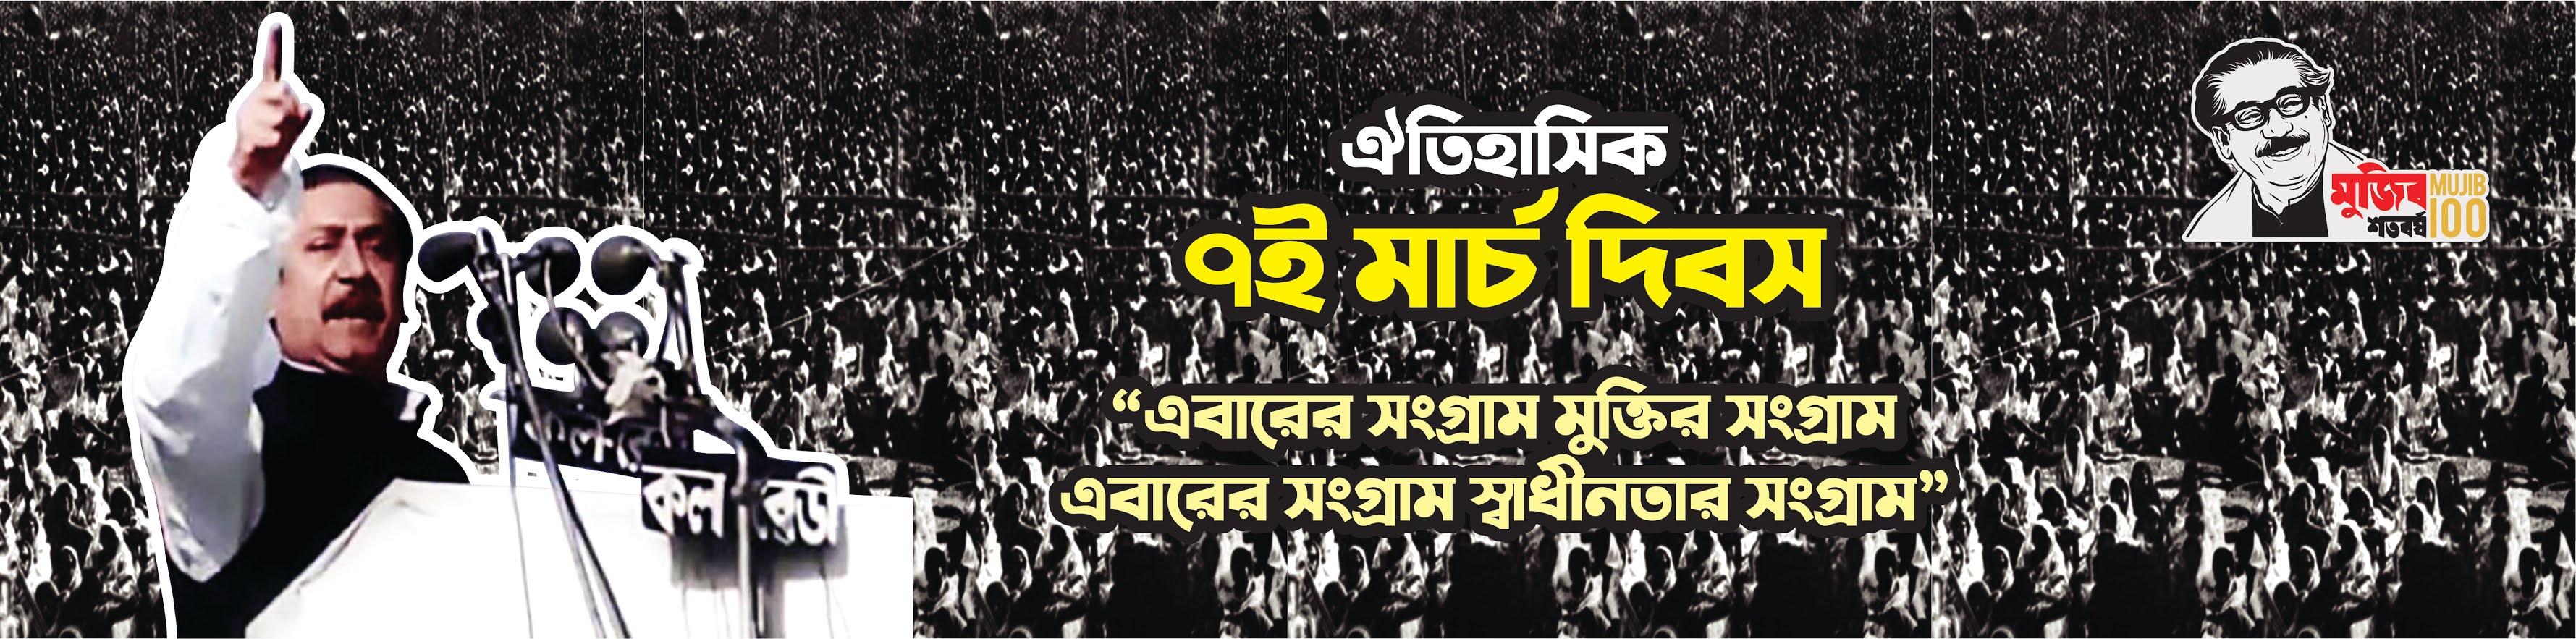 7 March  Bangabandhu | 7 মার্চ বঙ্গবন্ধুর ভাষণ